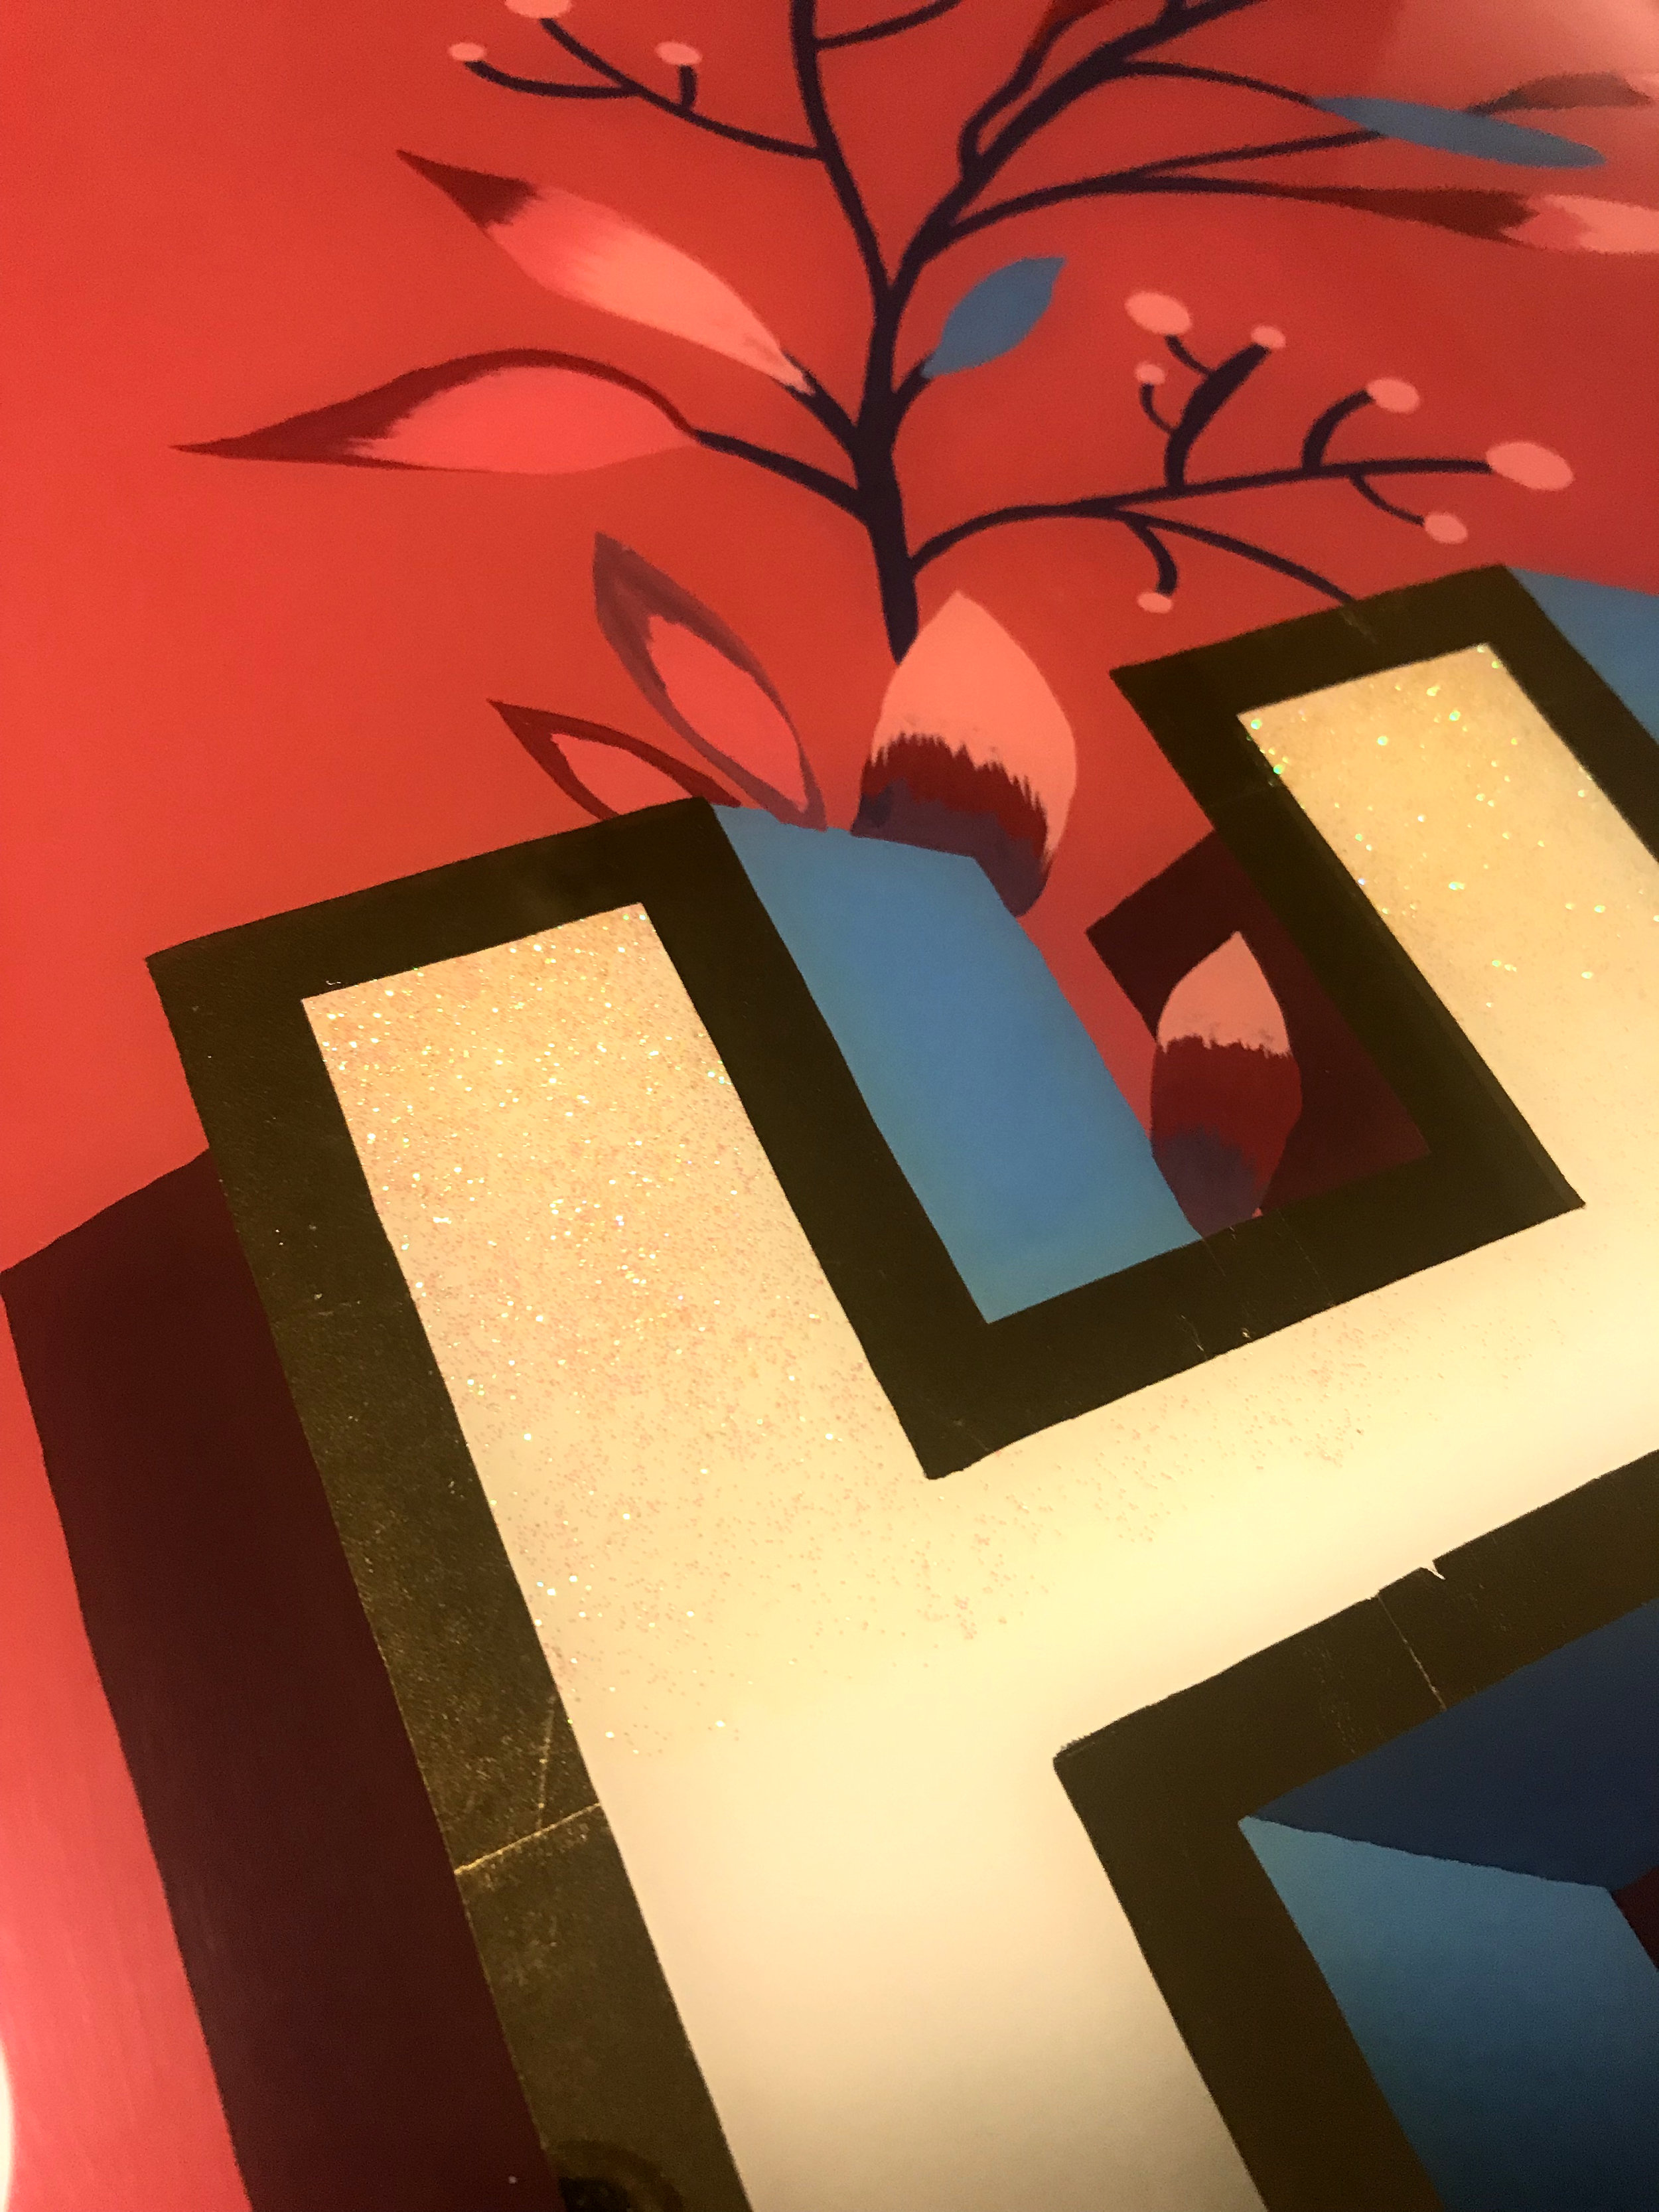 """H & C"": Wedding Present, Glass Gilding, Lettering, Hochzeitgeschenk, Vergoldung, Hinterglasmalerei, Schriftmalerei"